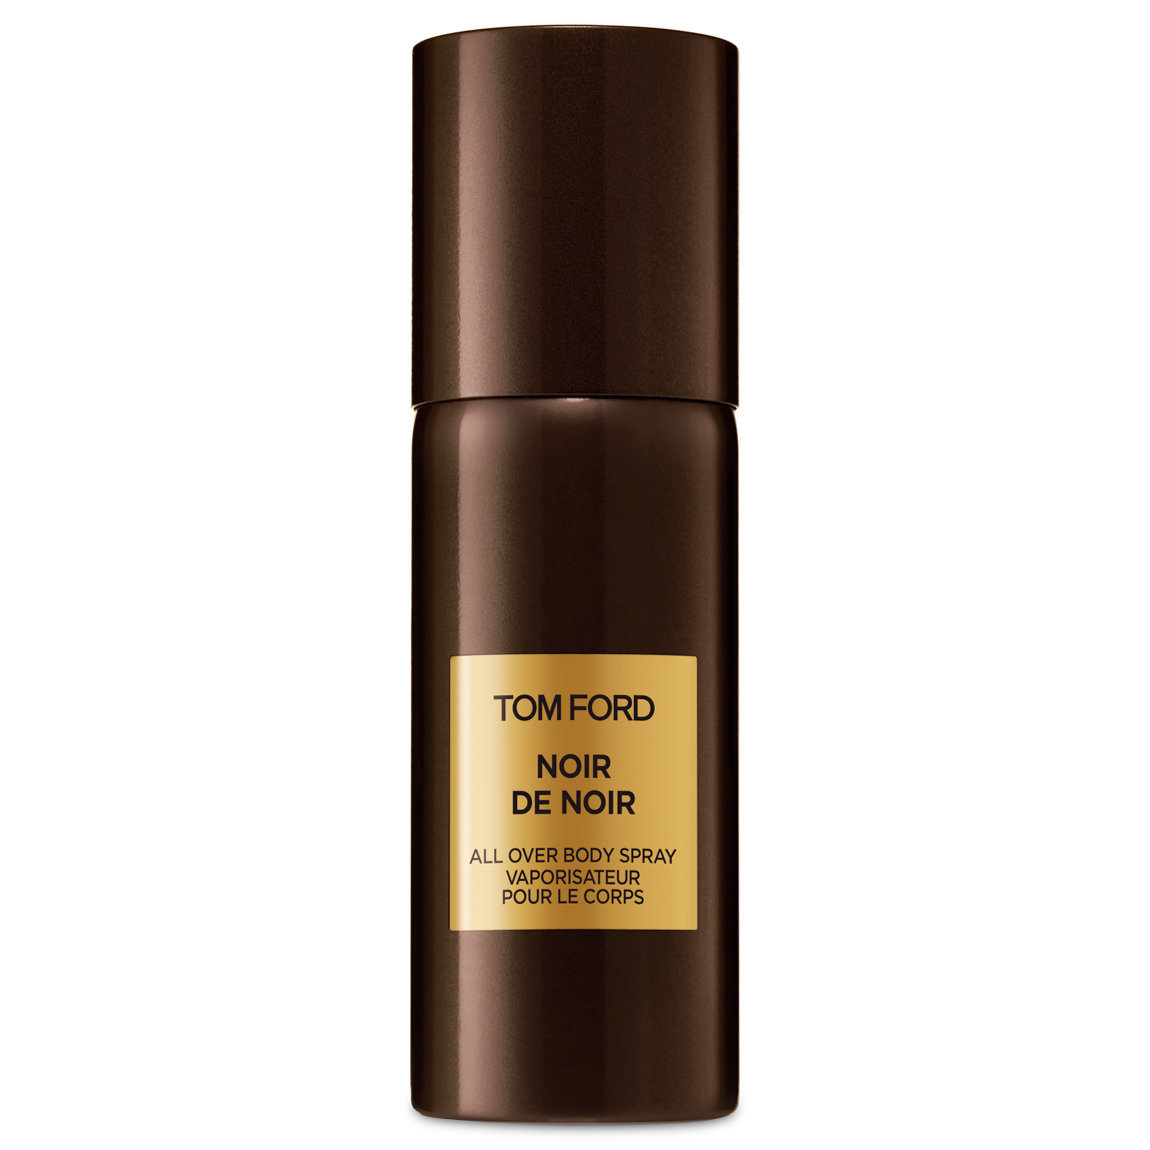 TOM FORD Noir de Noir All Over Body Spray alternative view 1 - product swatch.